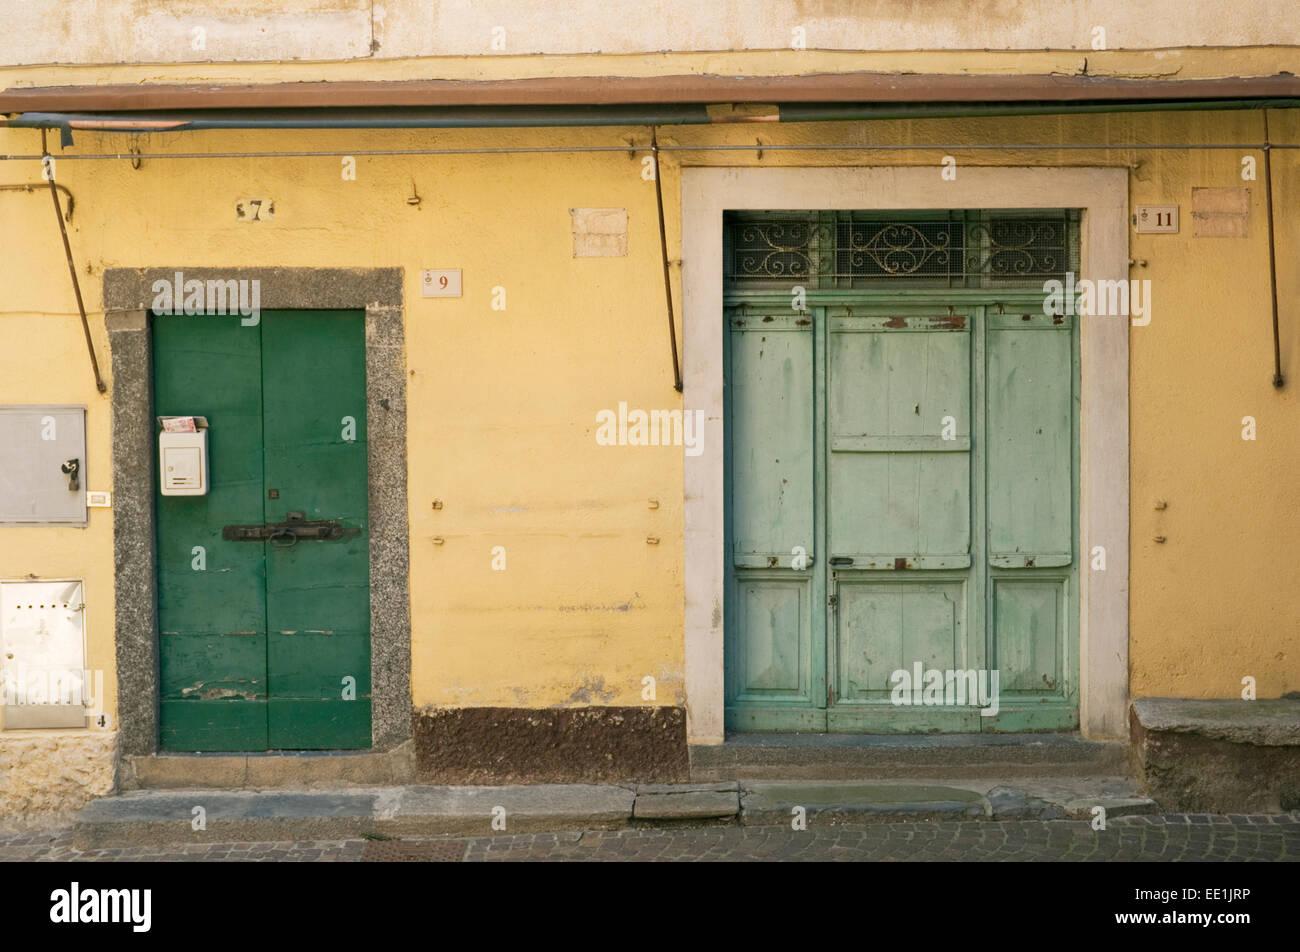 Abandoned edifice, Italy - Stock Image